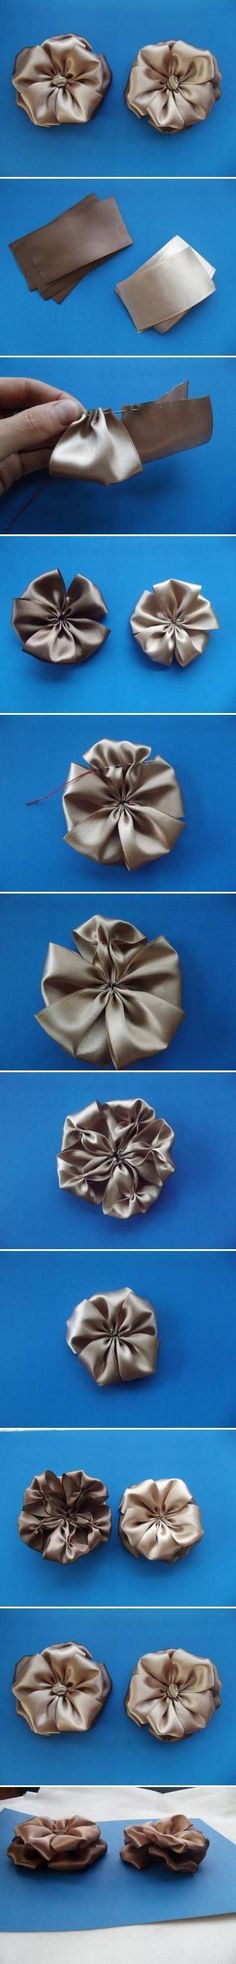 Flowers Diy Fabric Hair Bows Ideas For 2019 Ribbon Art, Diy Ribbon, Ribbon Crafts, Fabric Ribbon, Flower Crafts, Diy Crafts, Ribbon Flower, Satin Ribbons, Satin Flowers